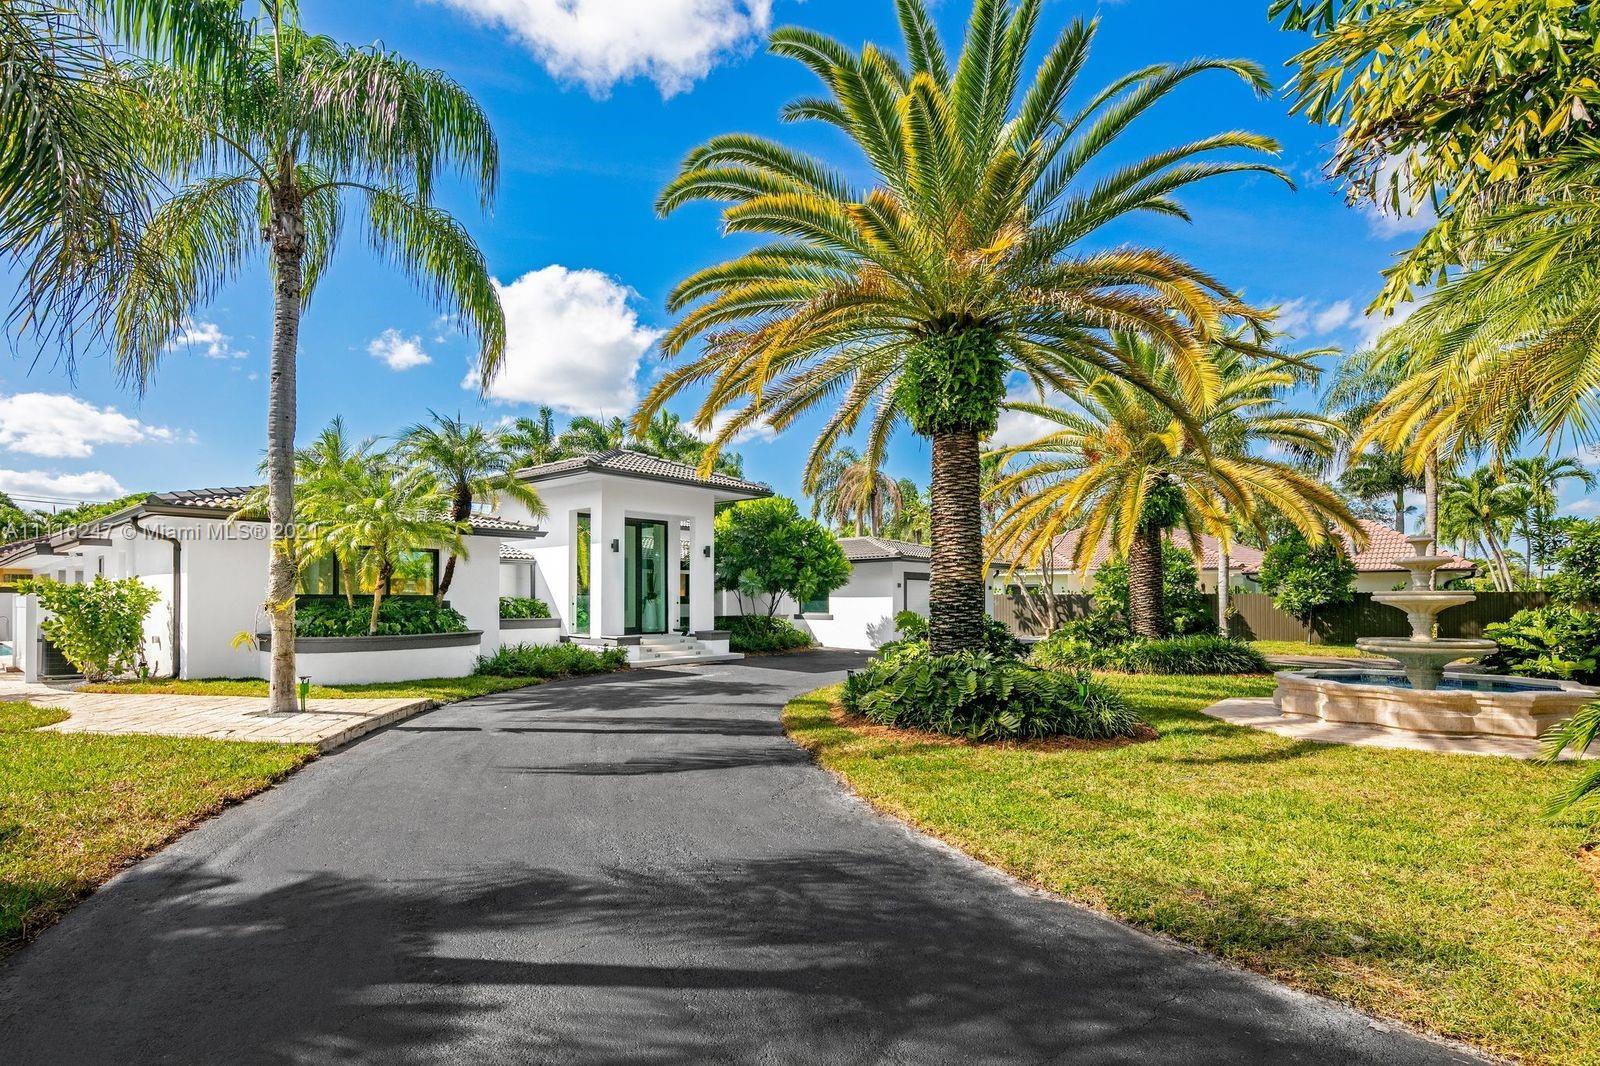 Single Family Home,For Sale,7300 SW 77th Ave, Miami, Florida 33143,Brickell,realty,broker,condos near me